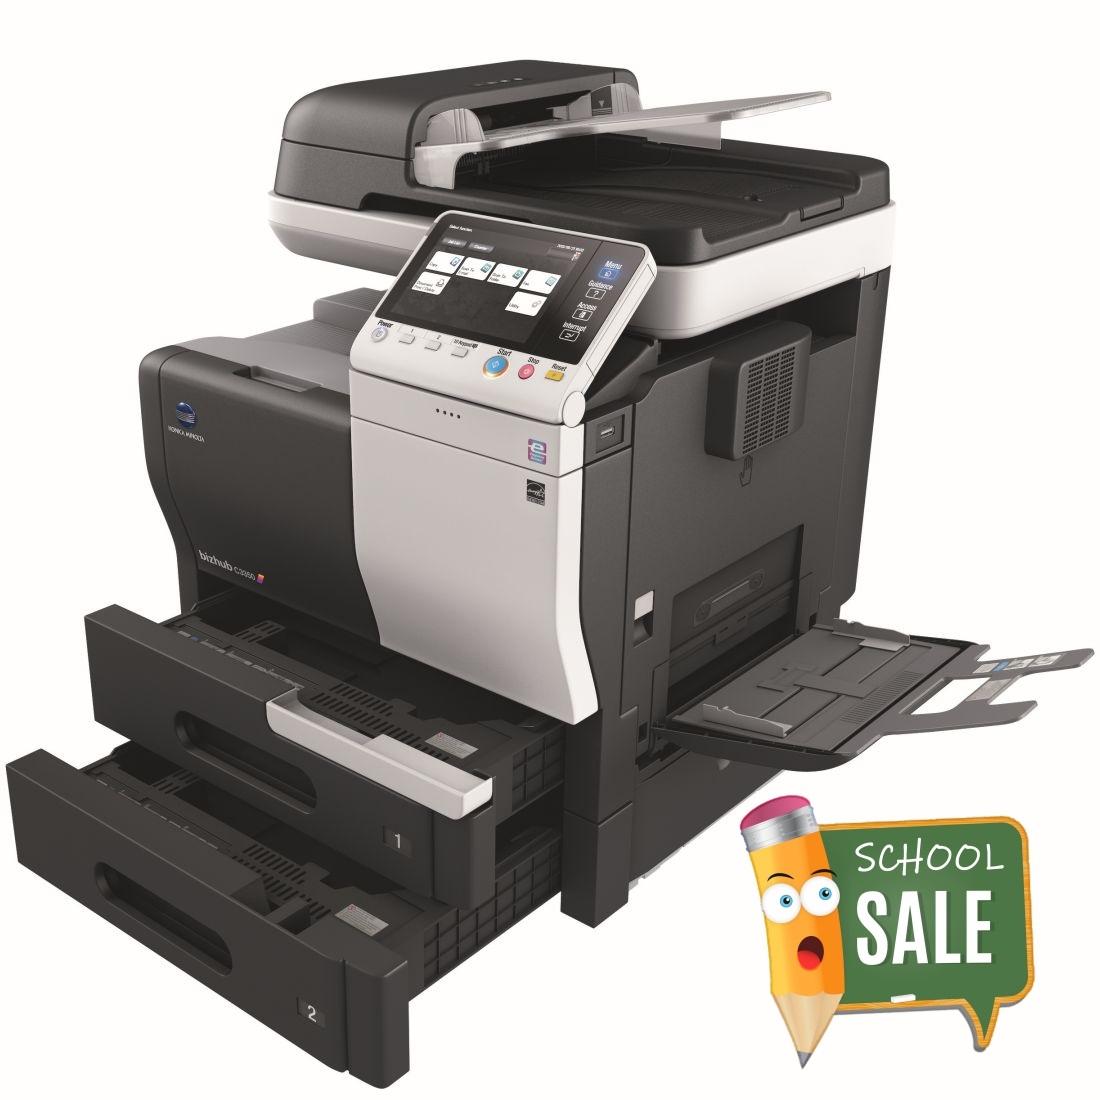 Konica Minolta Bizhub C3350 Colour Copier Printer Rental Price Offers Open Paper Trays Bypass